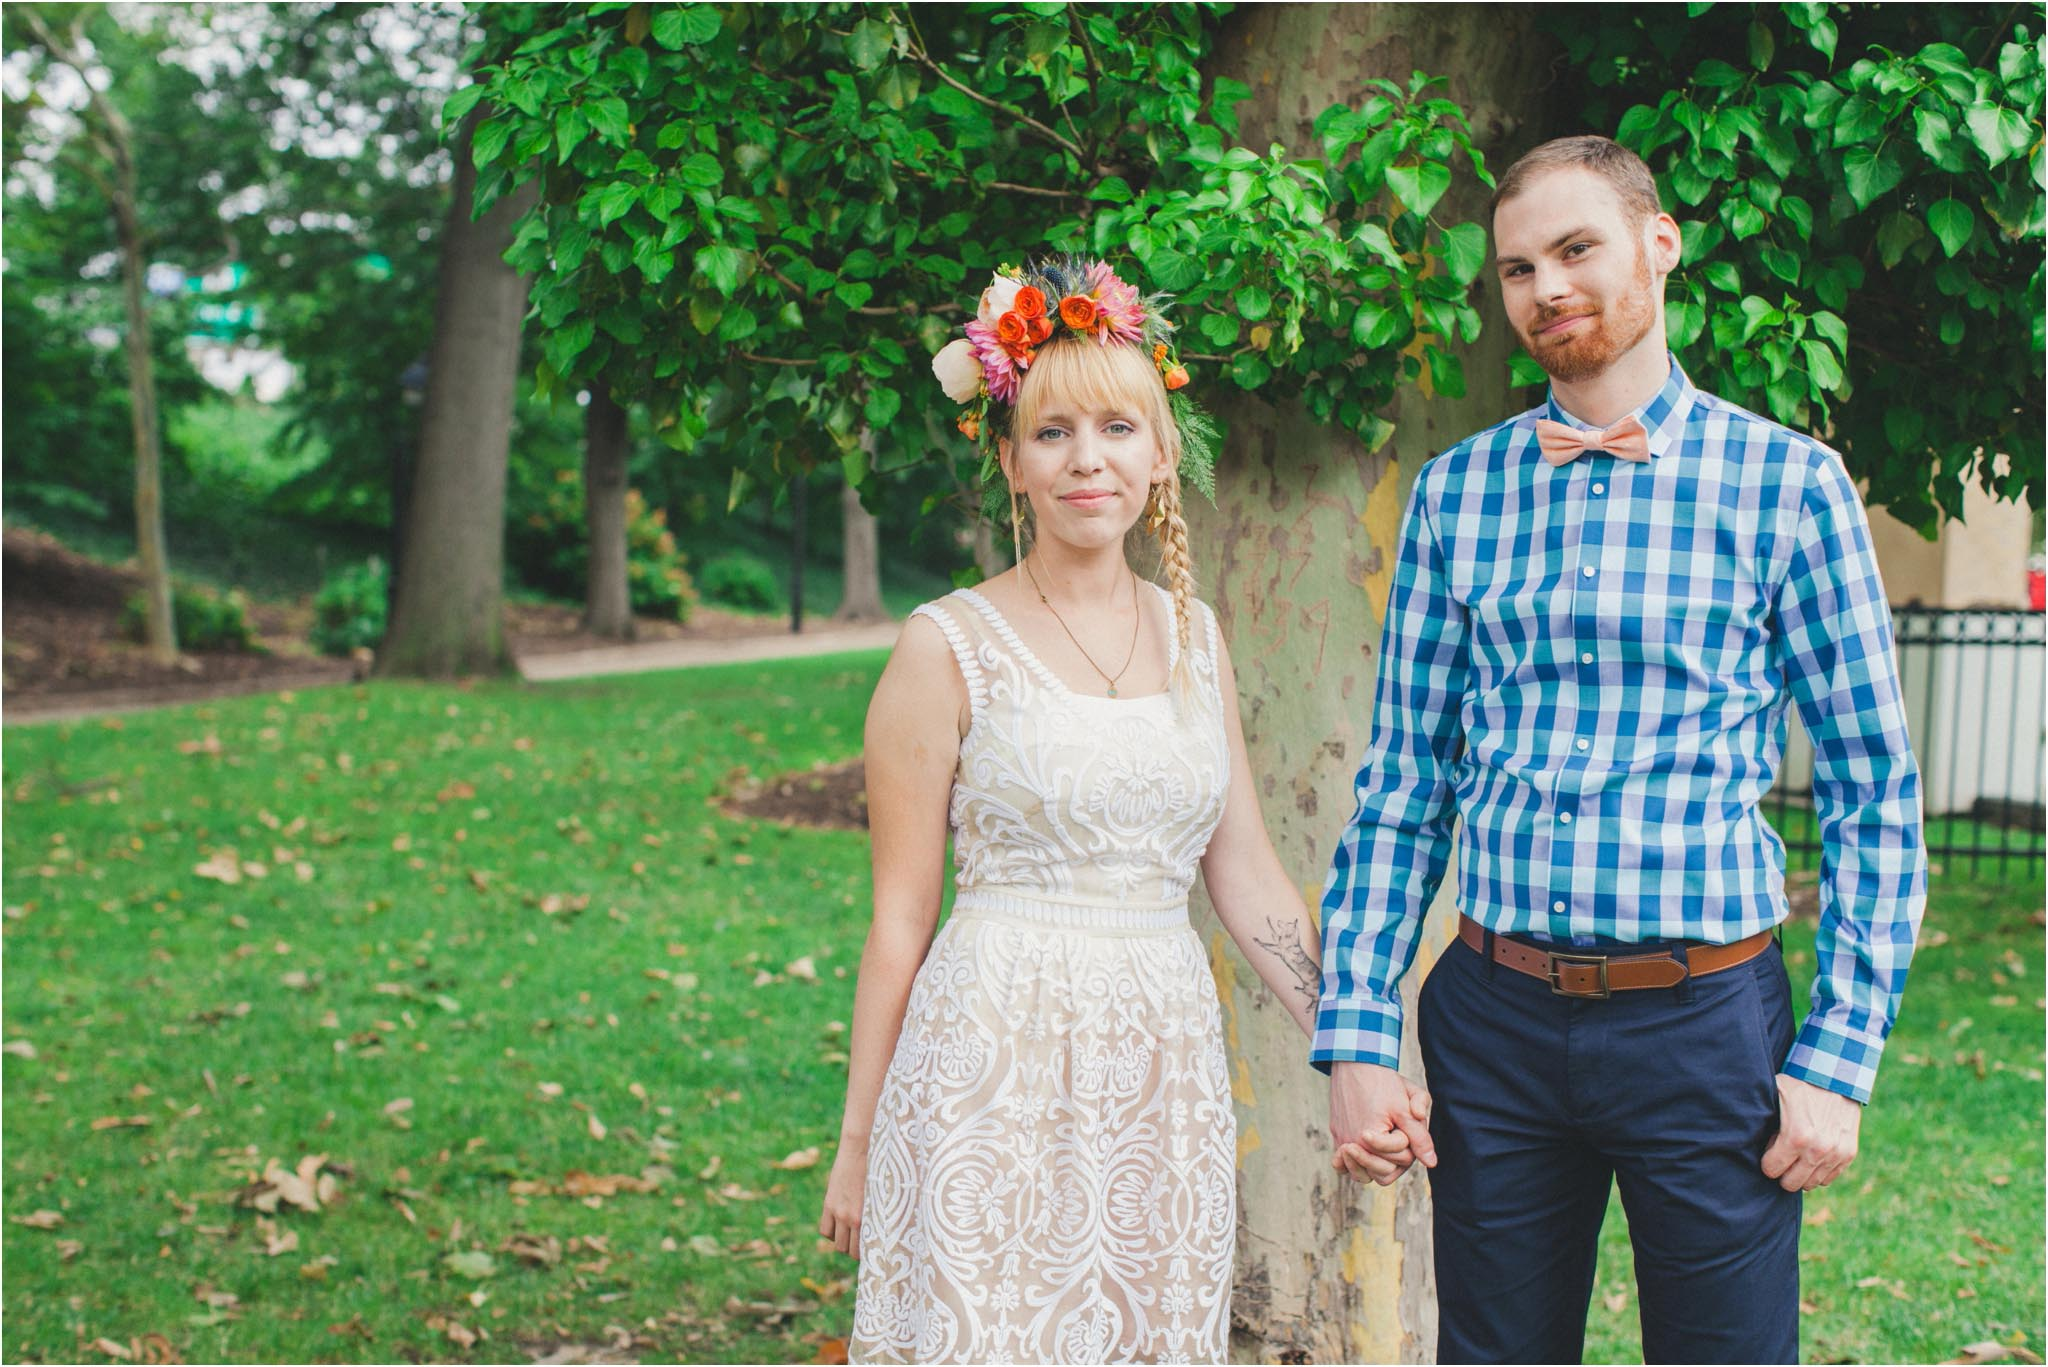 BHLDN dress, wedding